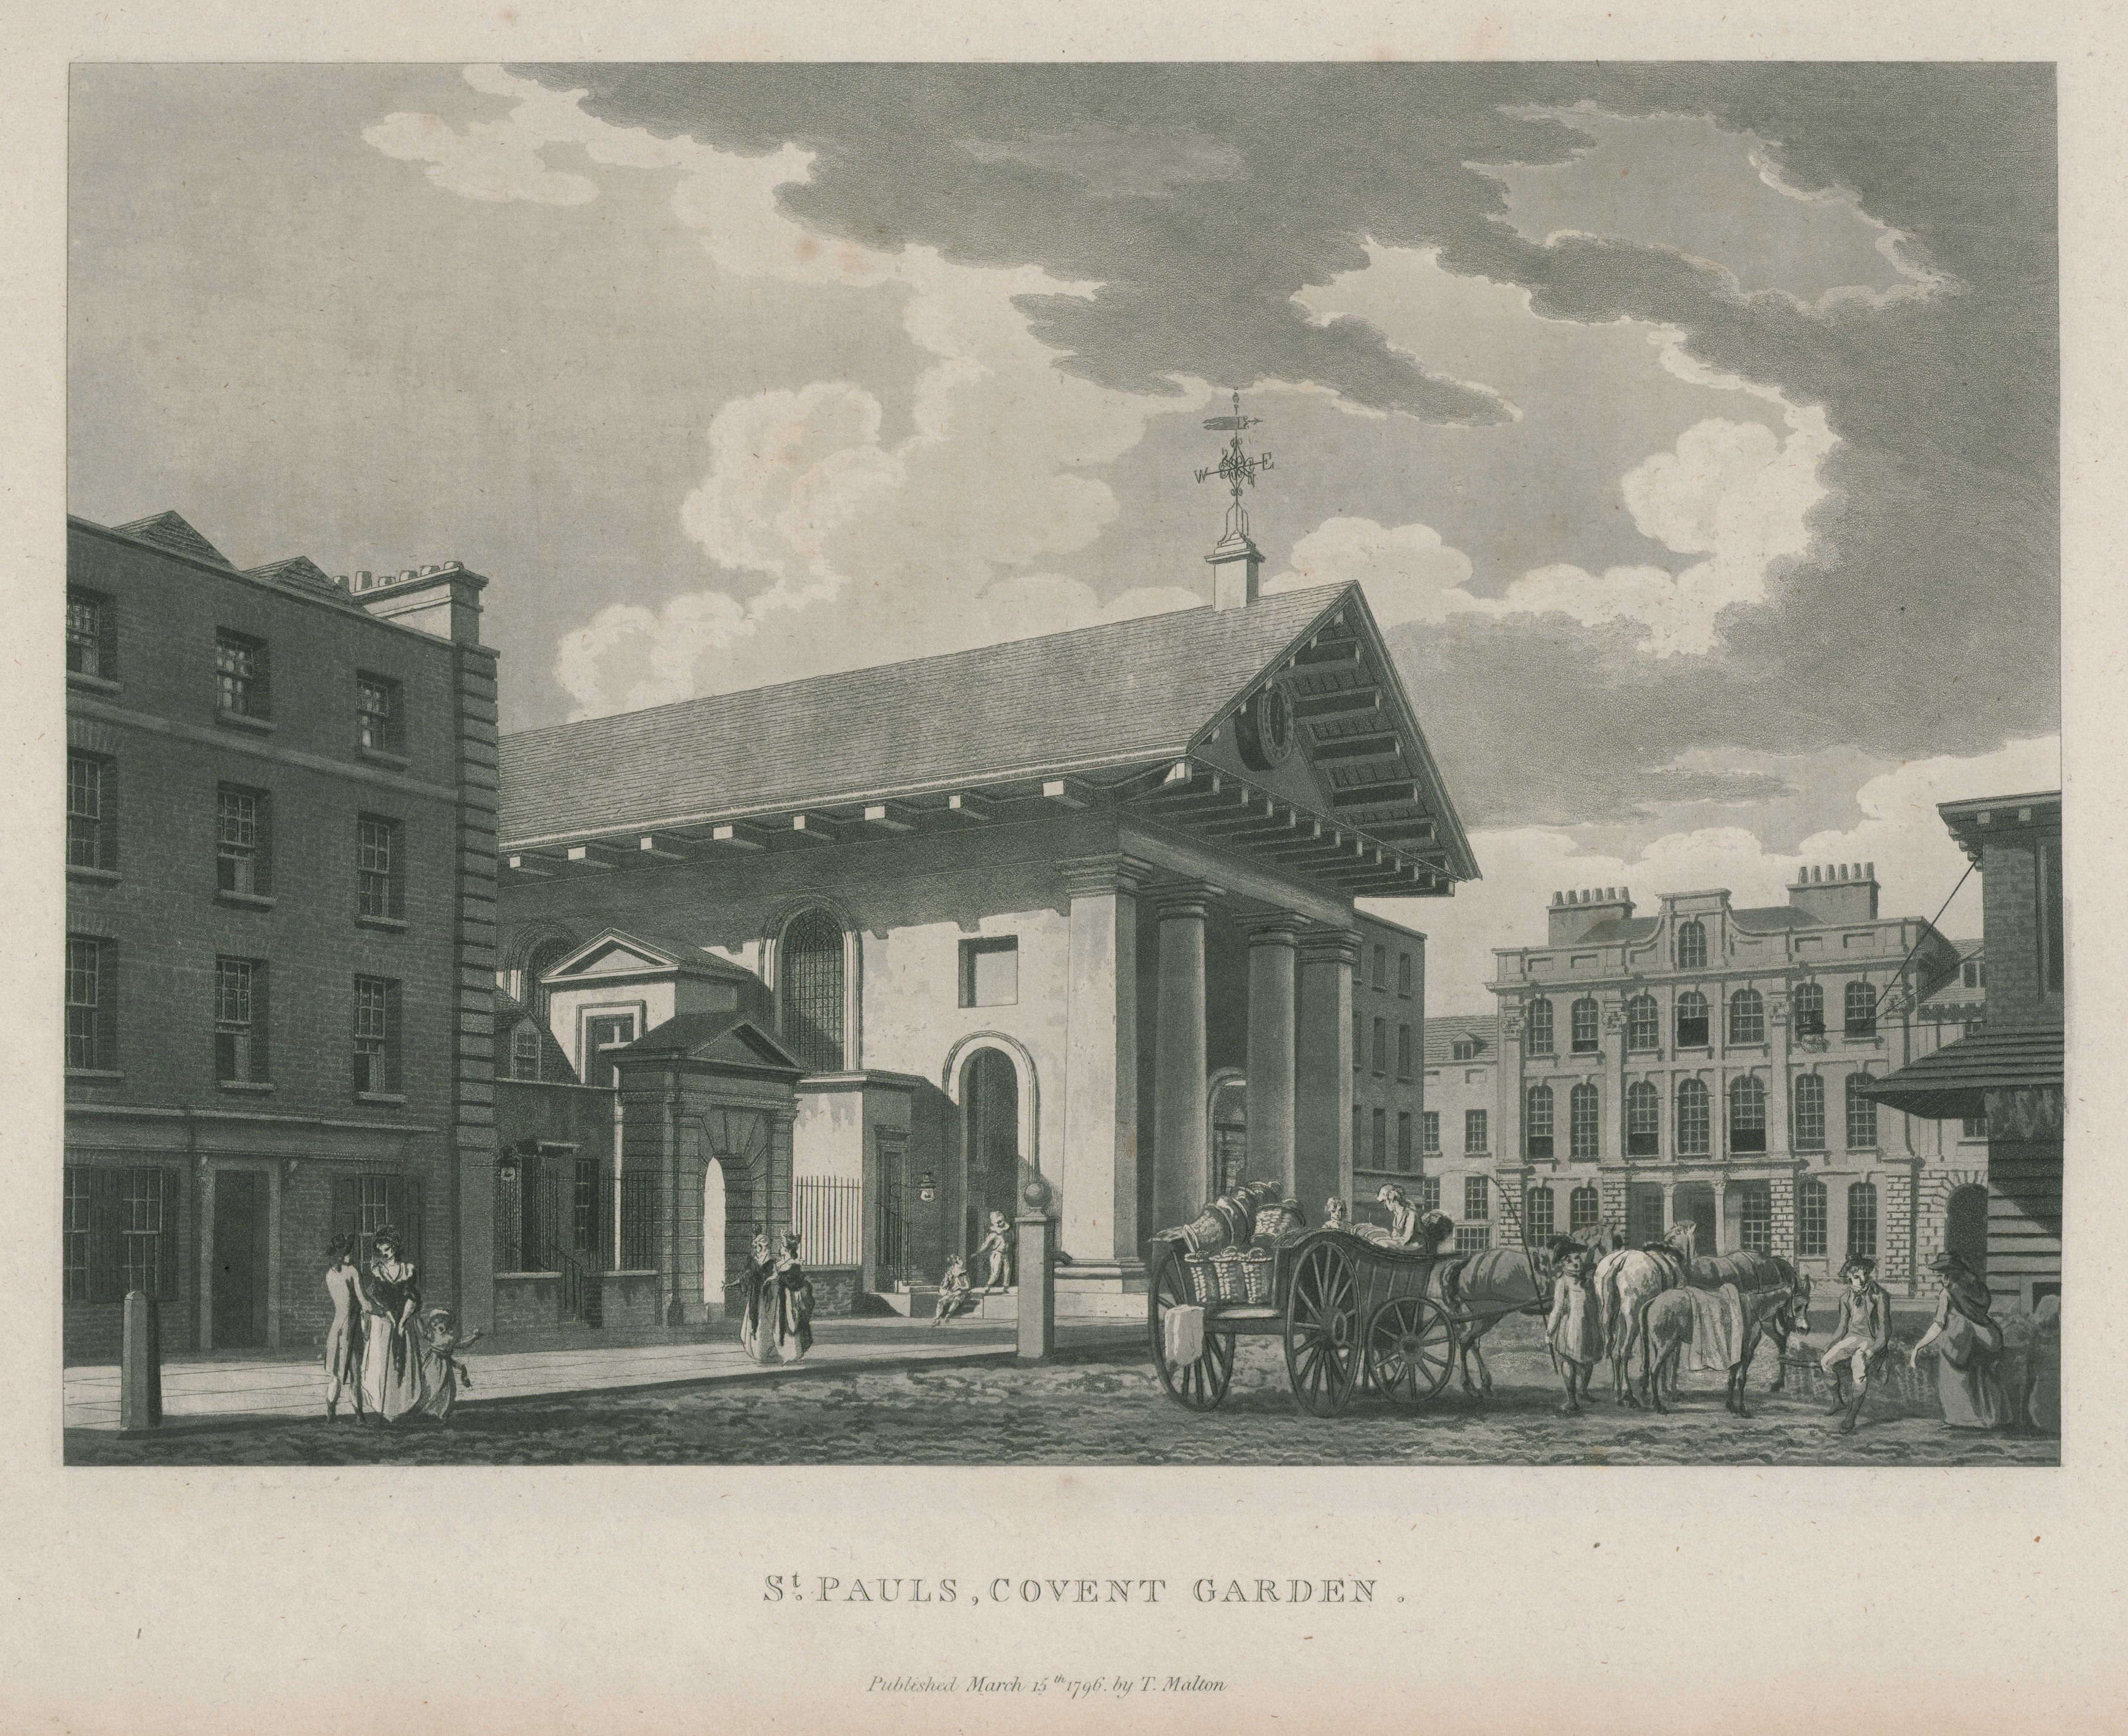 033 - Malton - St Pauls, Covent Garden